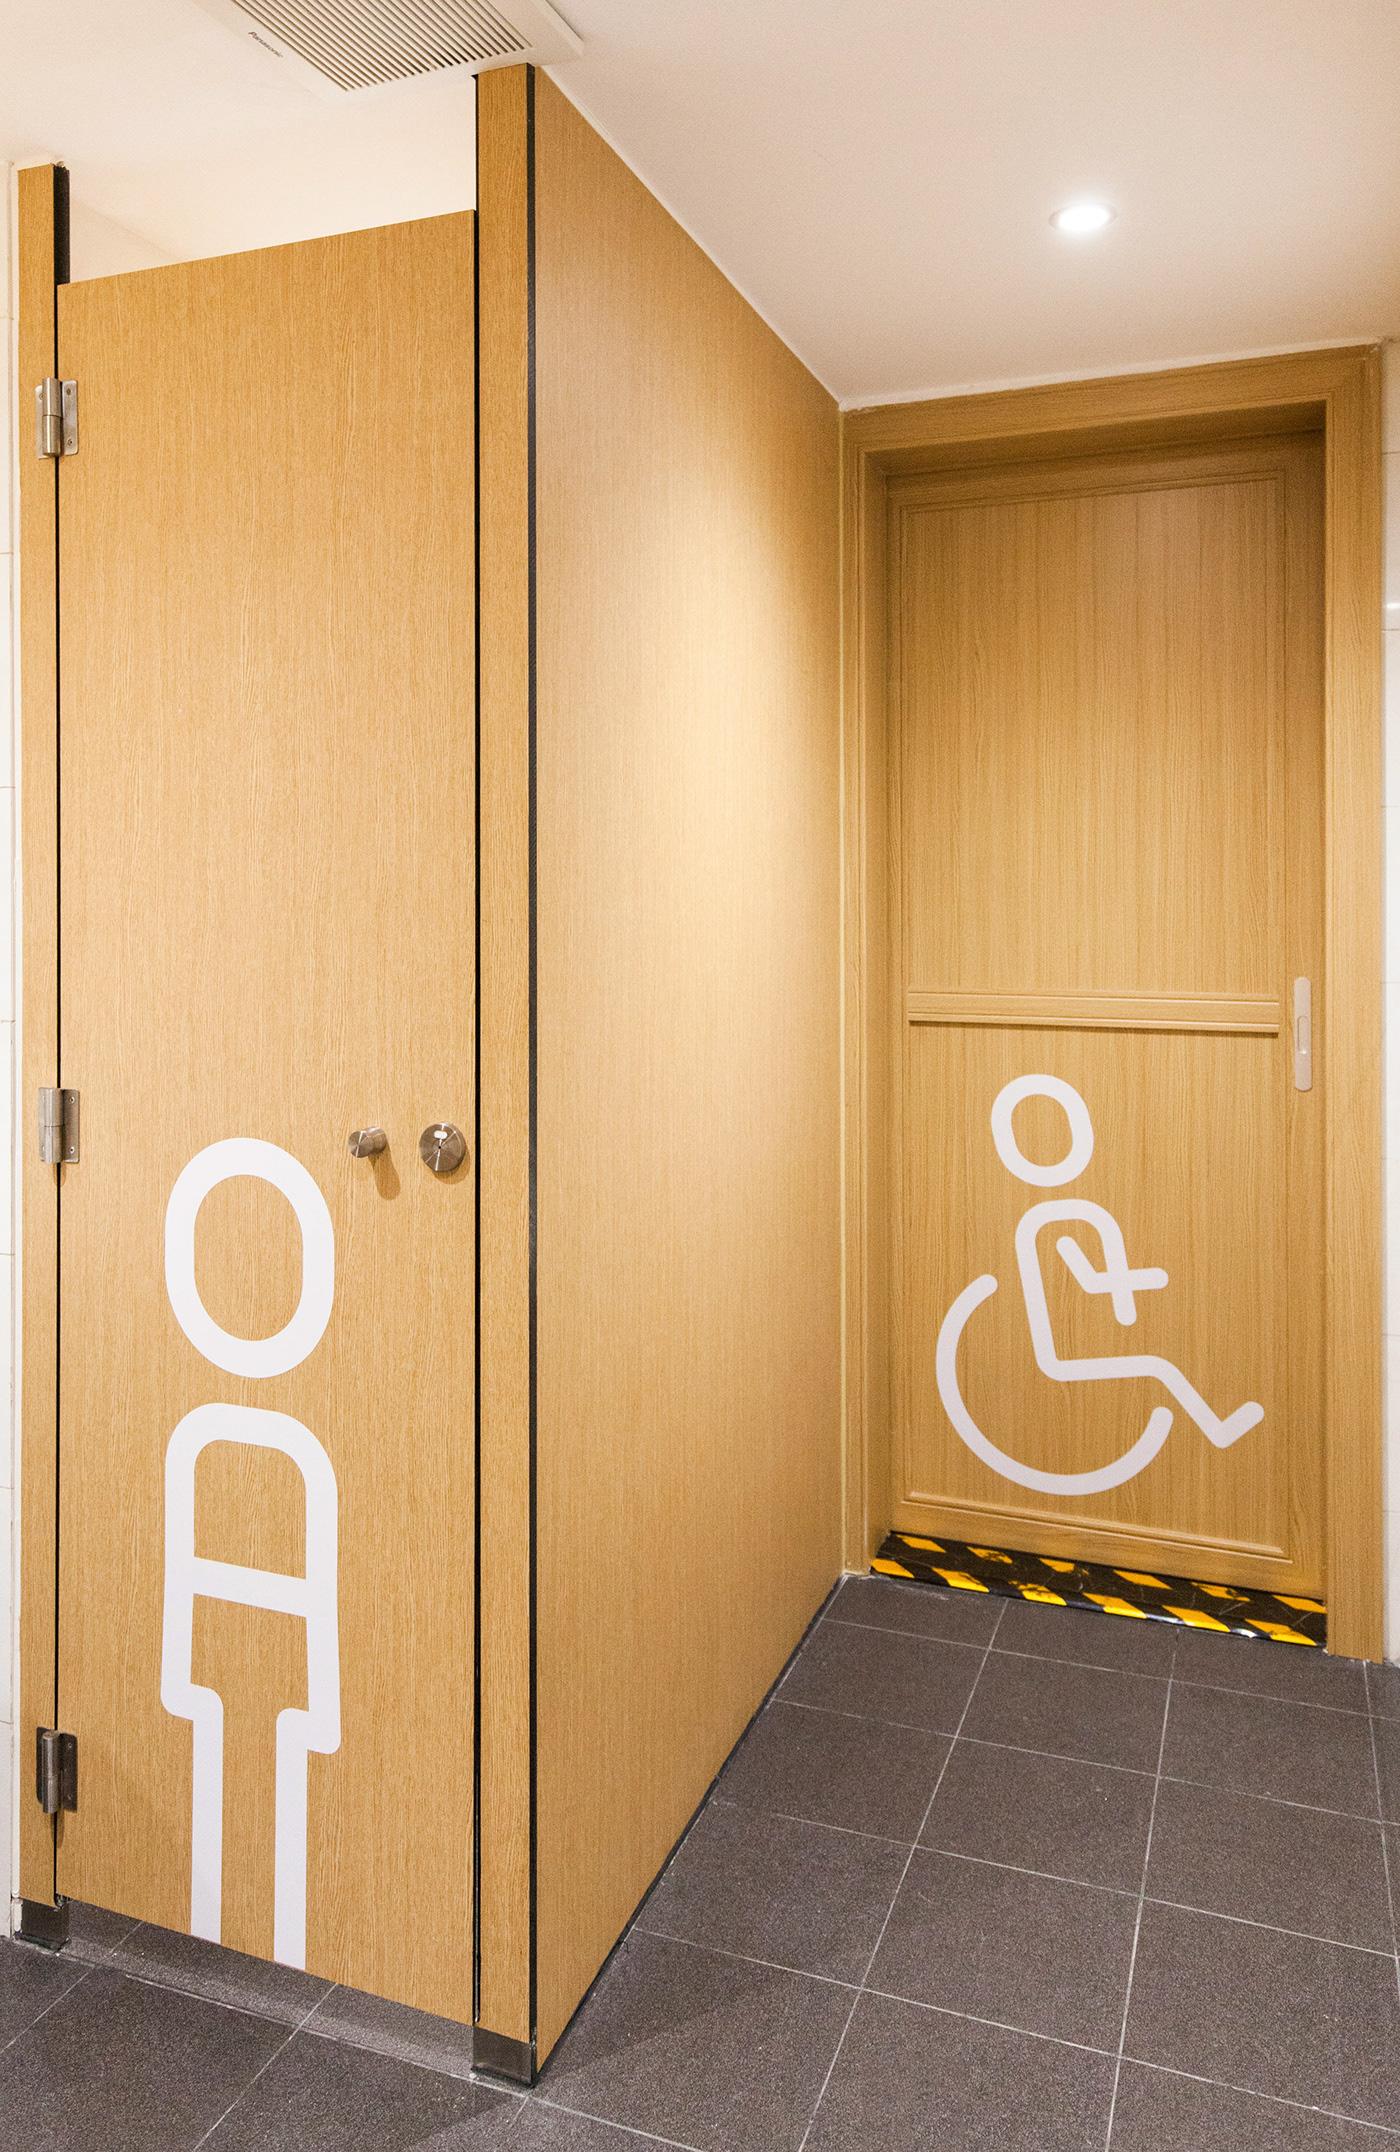 Image may contain: floor, door and building